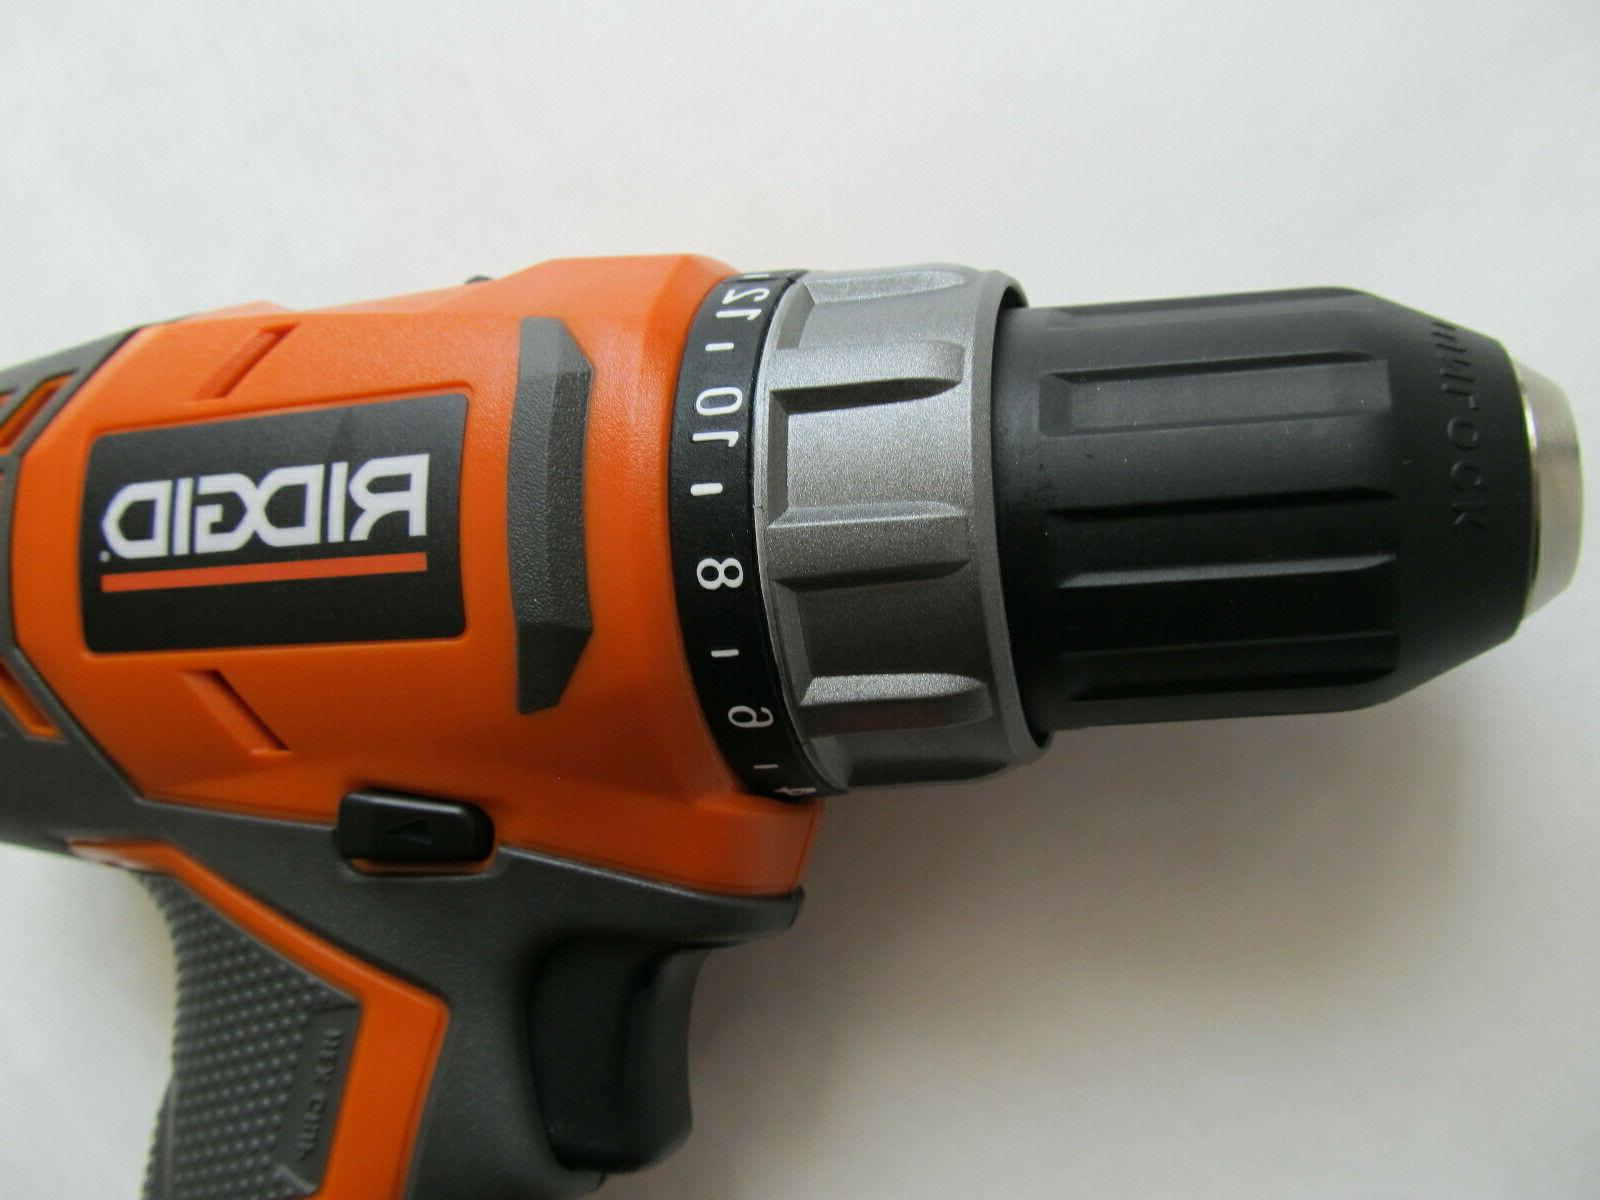 Ridgid R860052 18V Drill/Driver